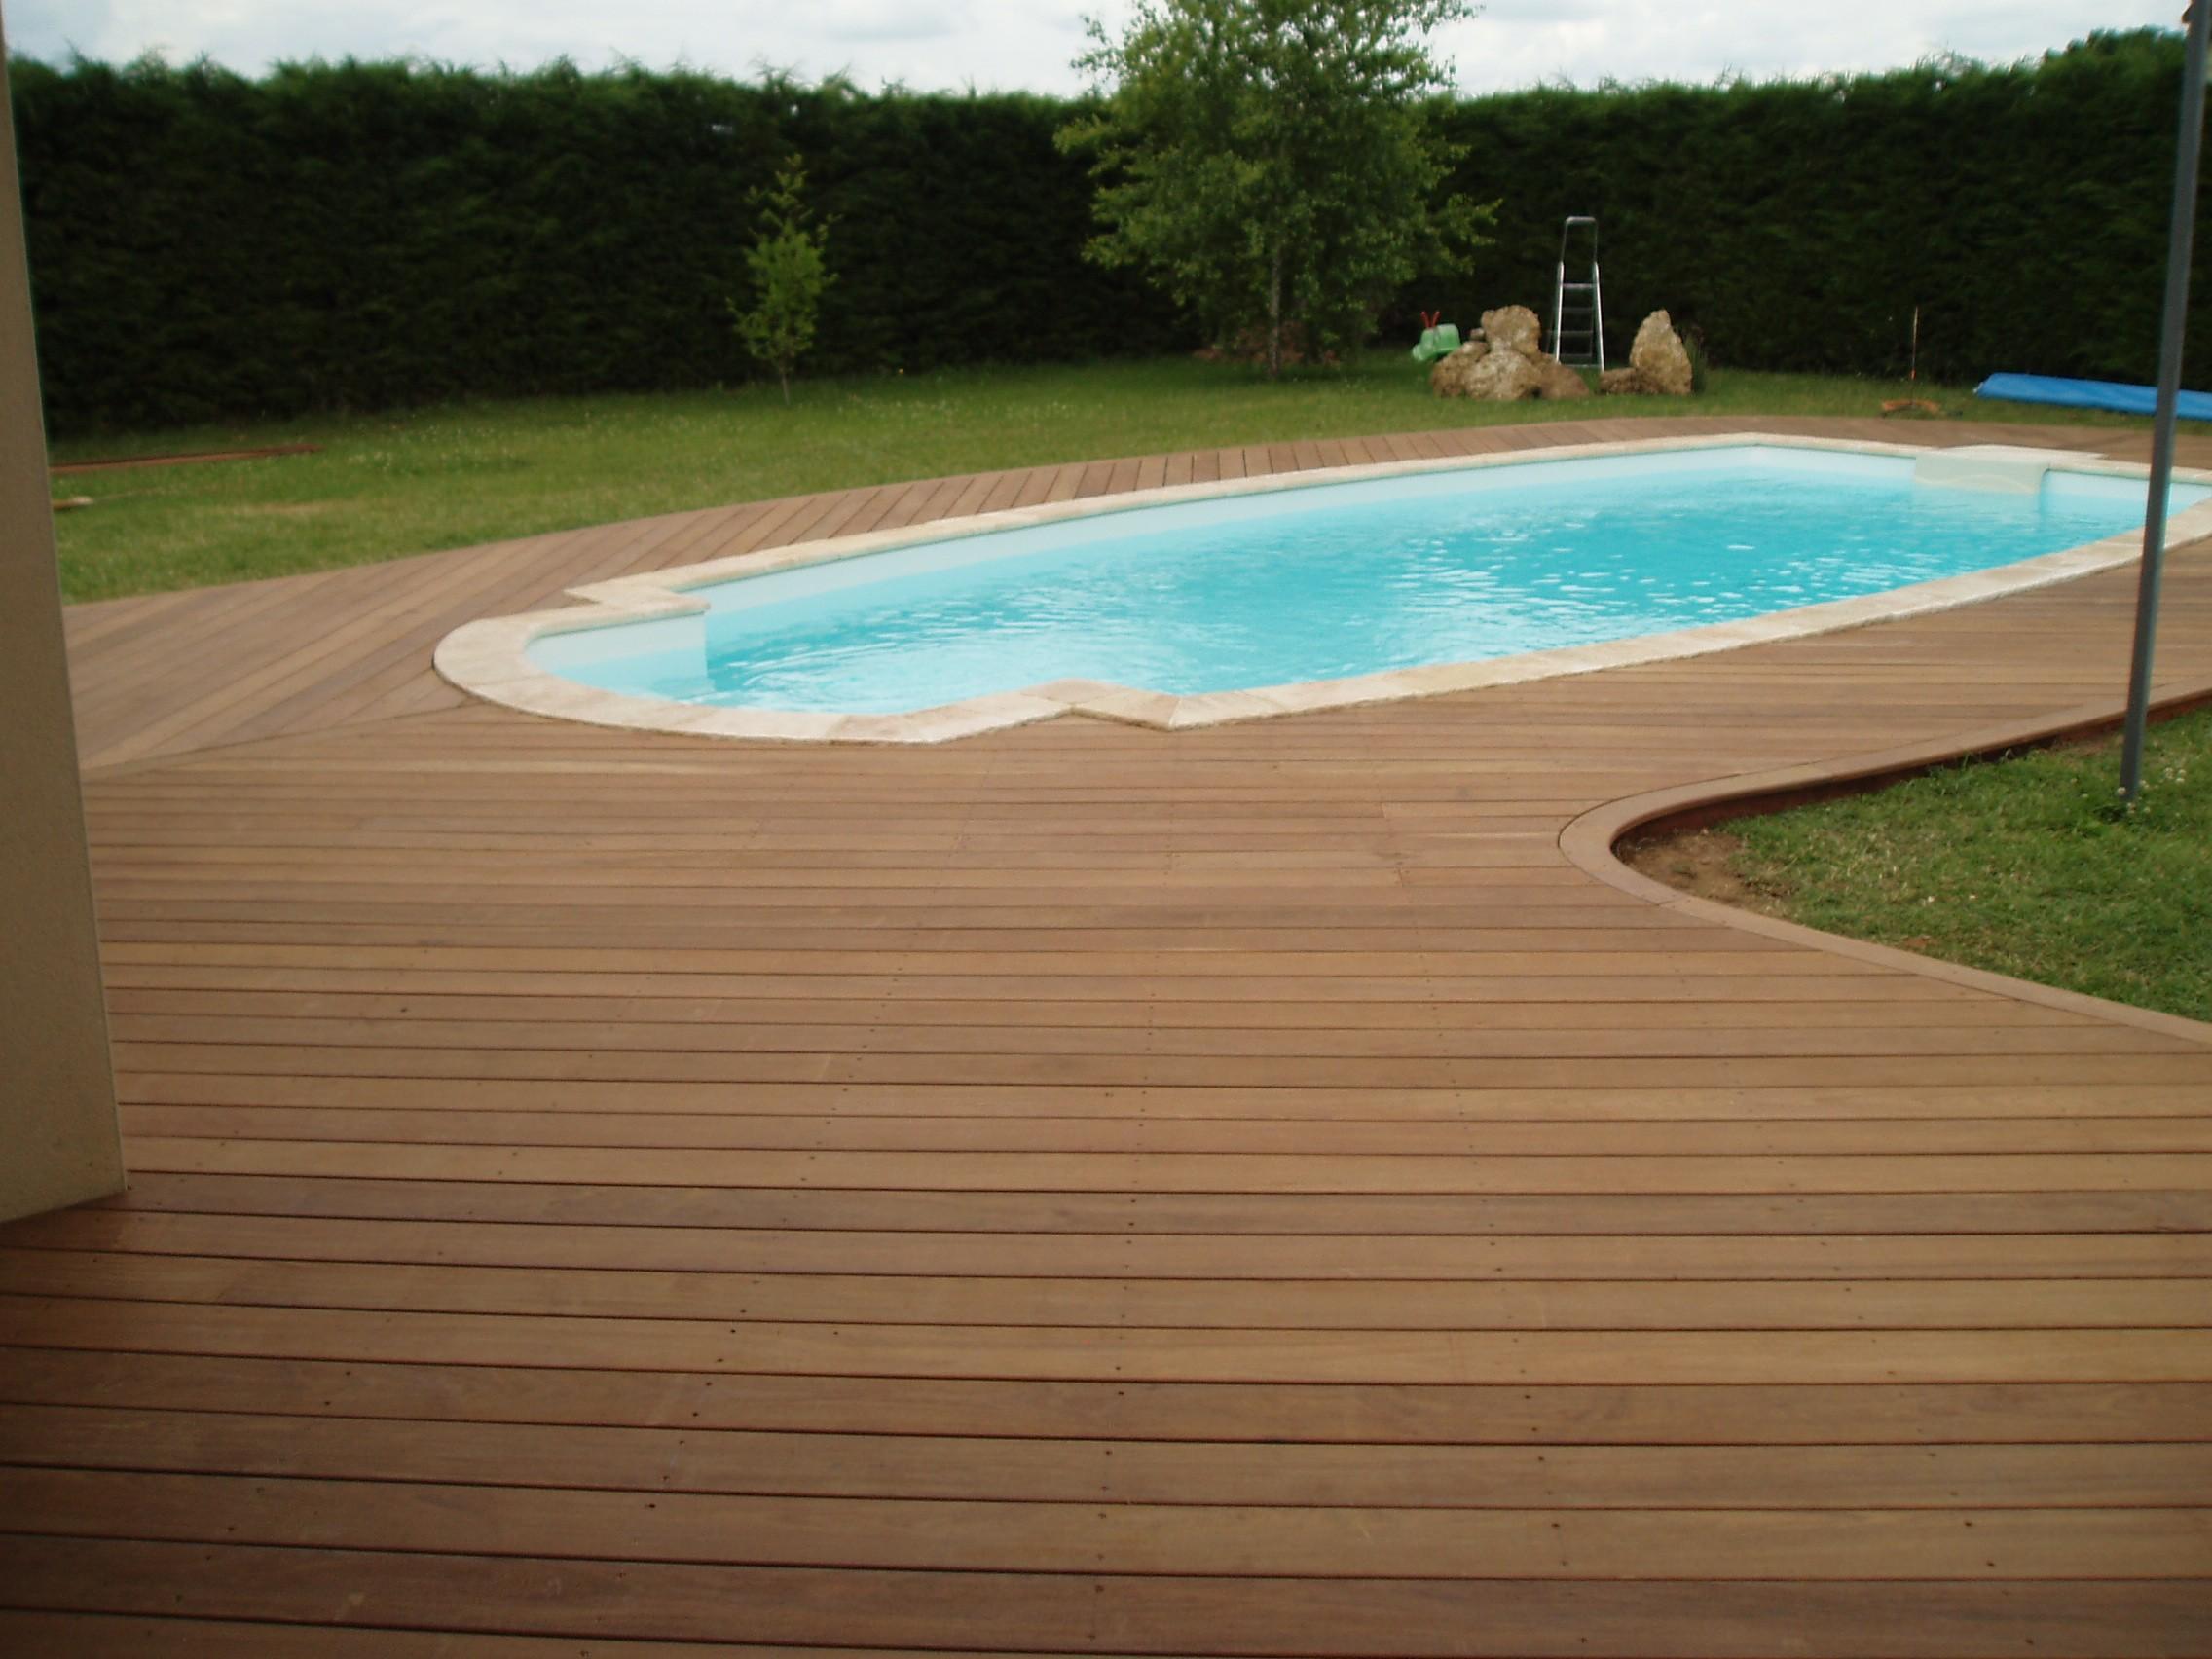 Terrasse piscine mixte Piscine en bois prix